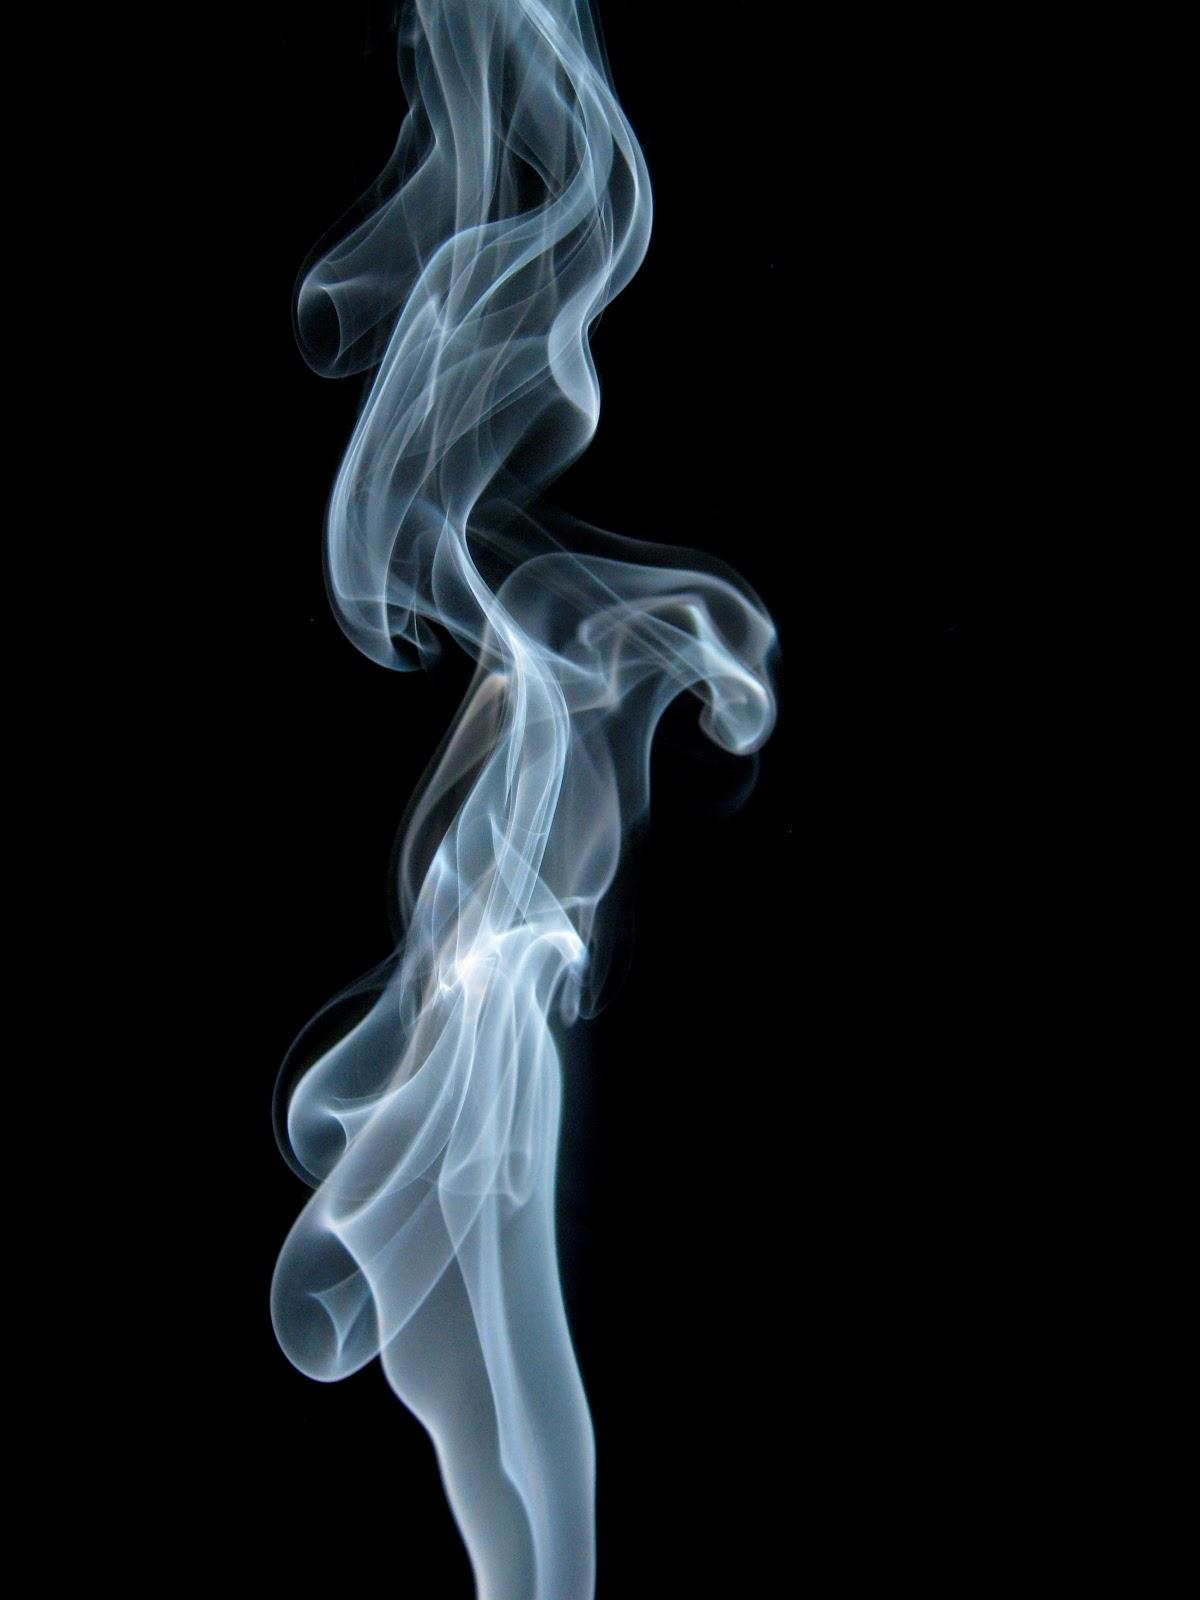 Cigarette Smoking Art